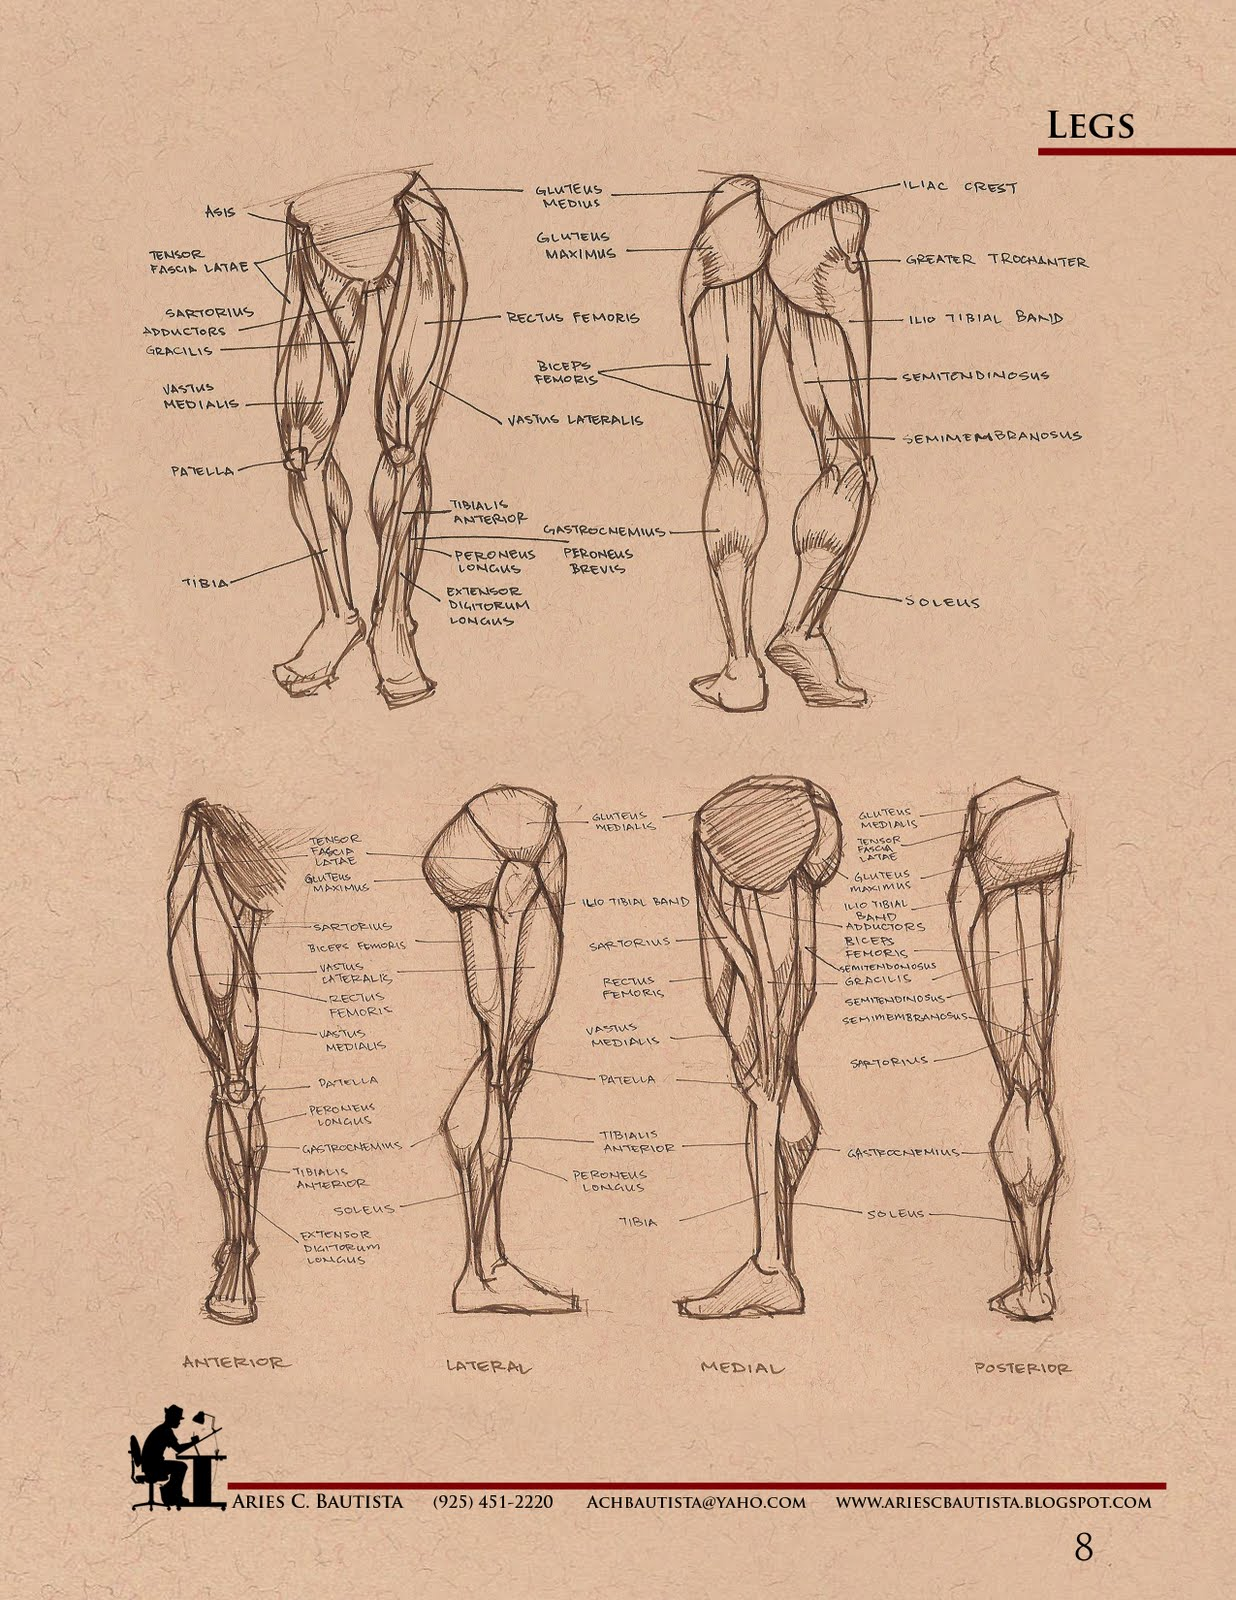 Aries C. Bautista: Comparative Anatomy Book